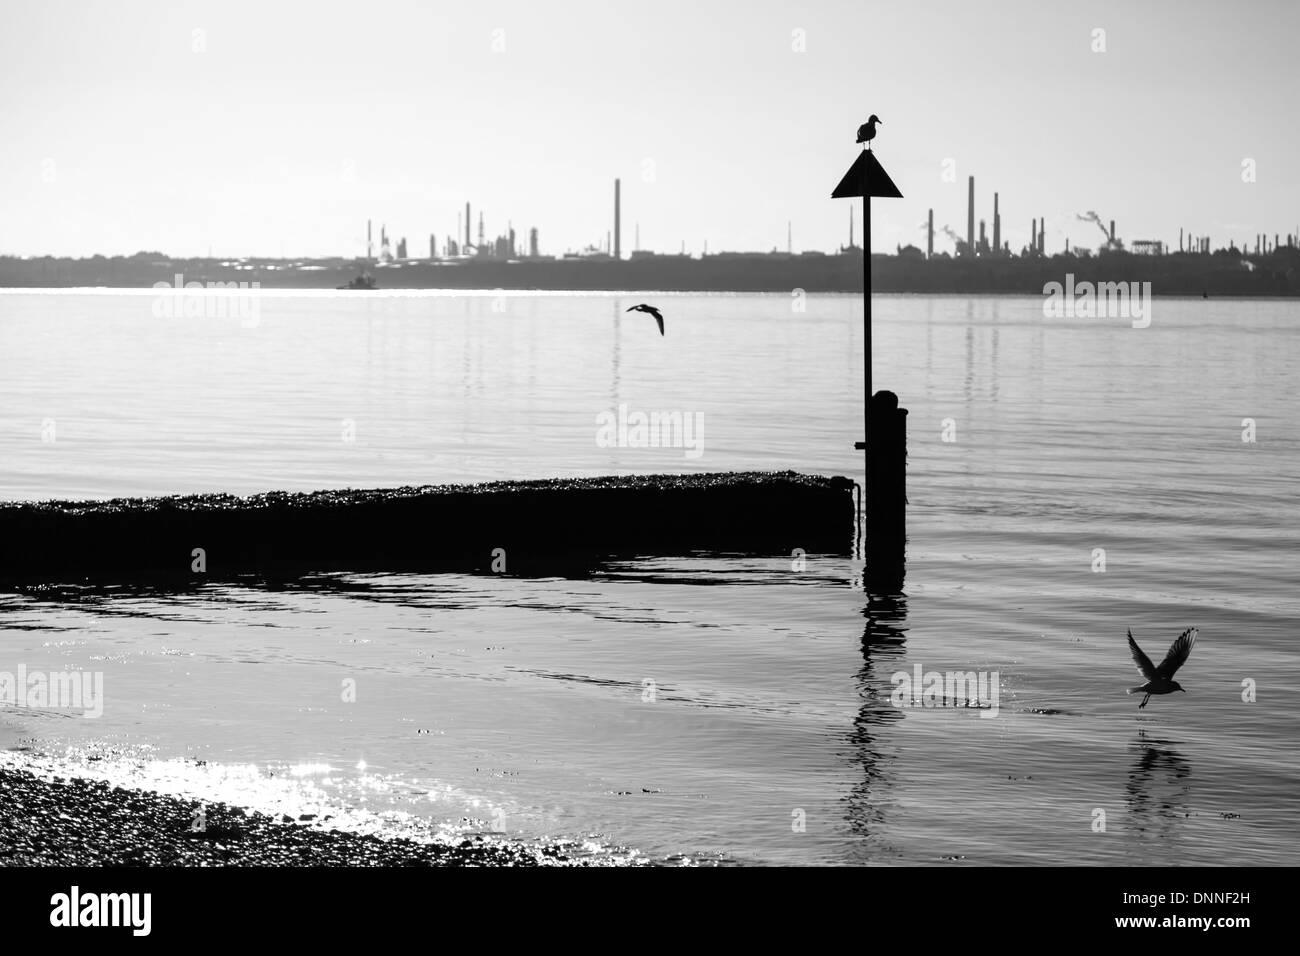 Weston Shore Southampton - Stock Image